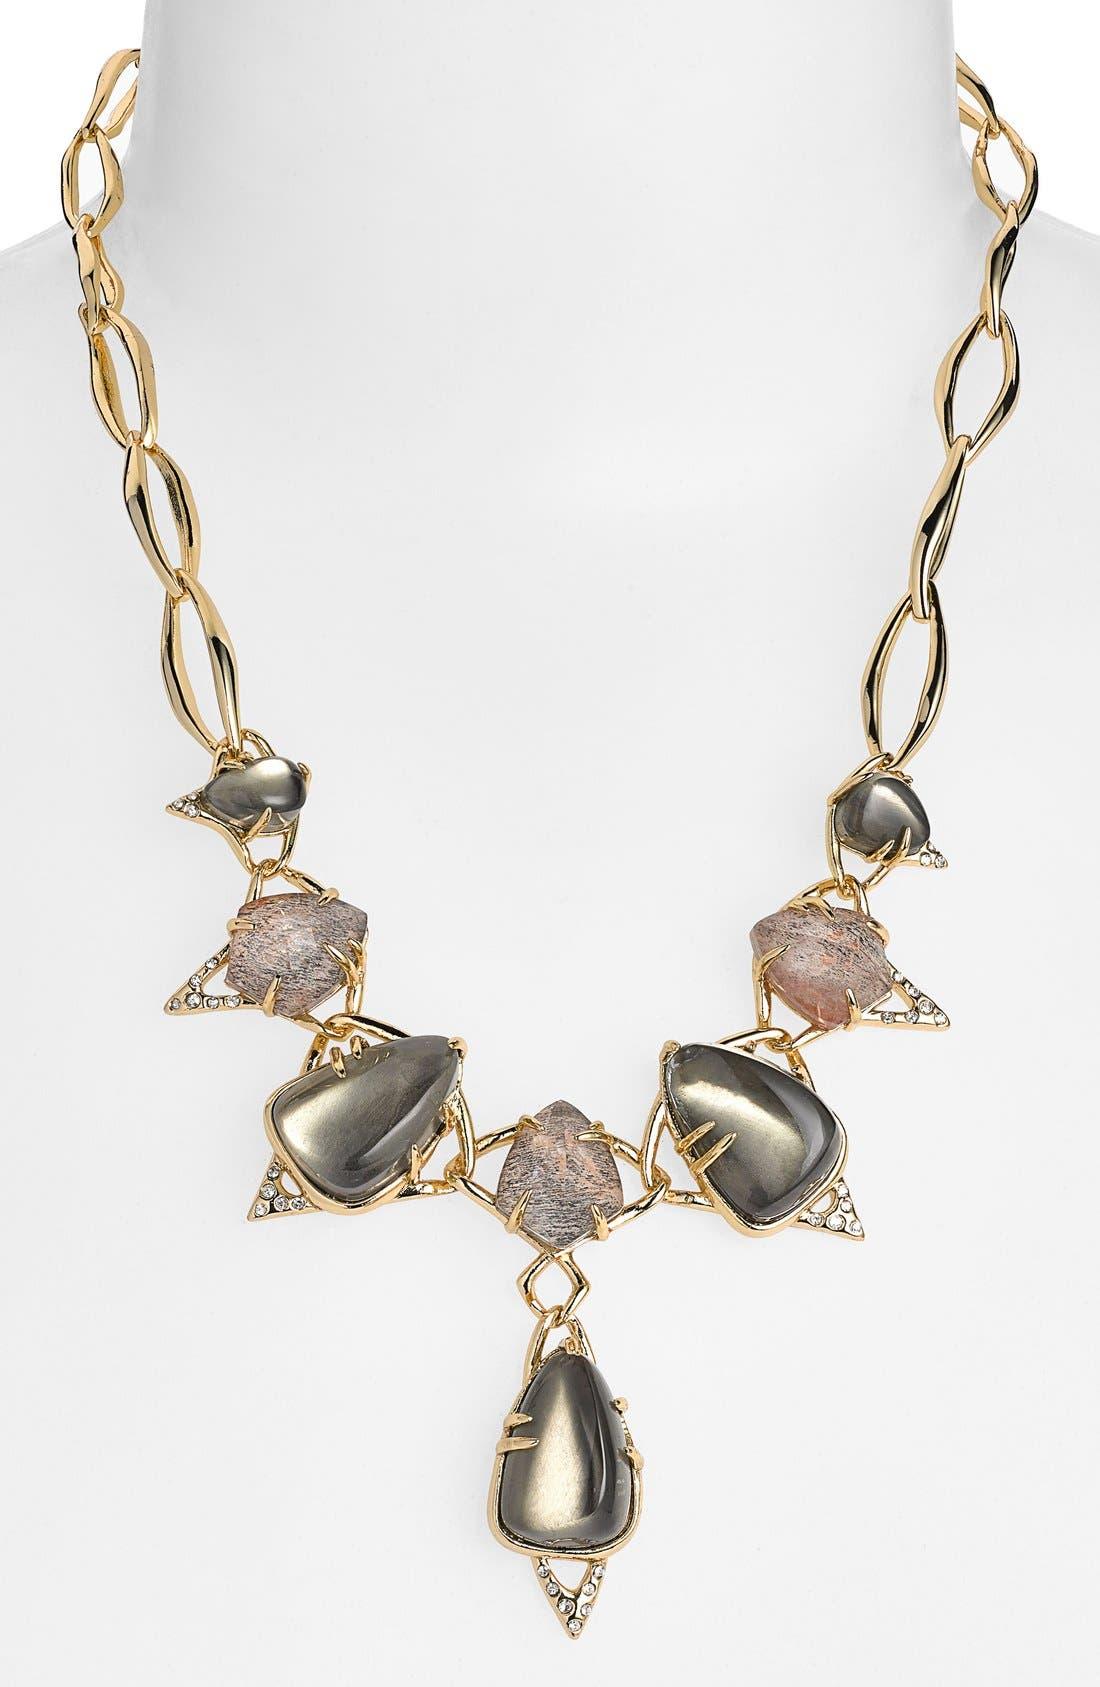 Alternate Image 1 Selected - Alexis Bittar 'Miss Havisham - Kinetic Gold' Frontal Necklace